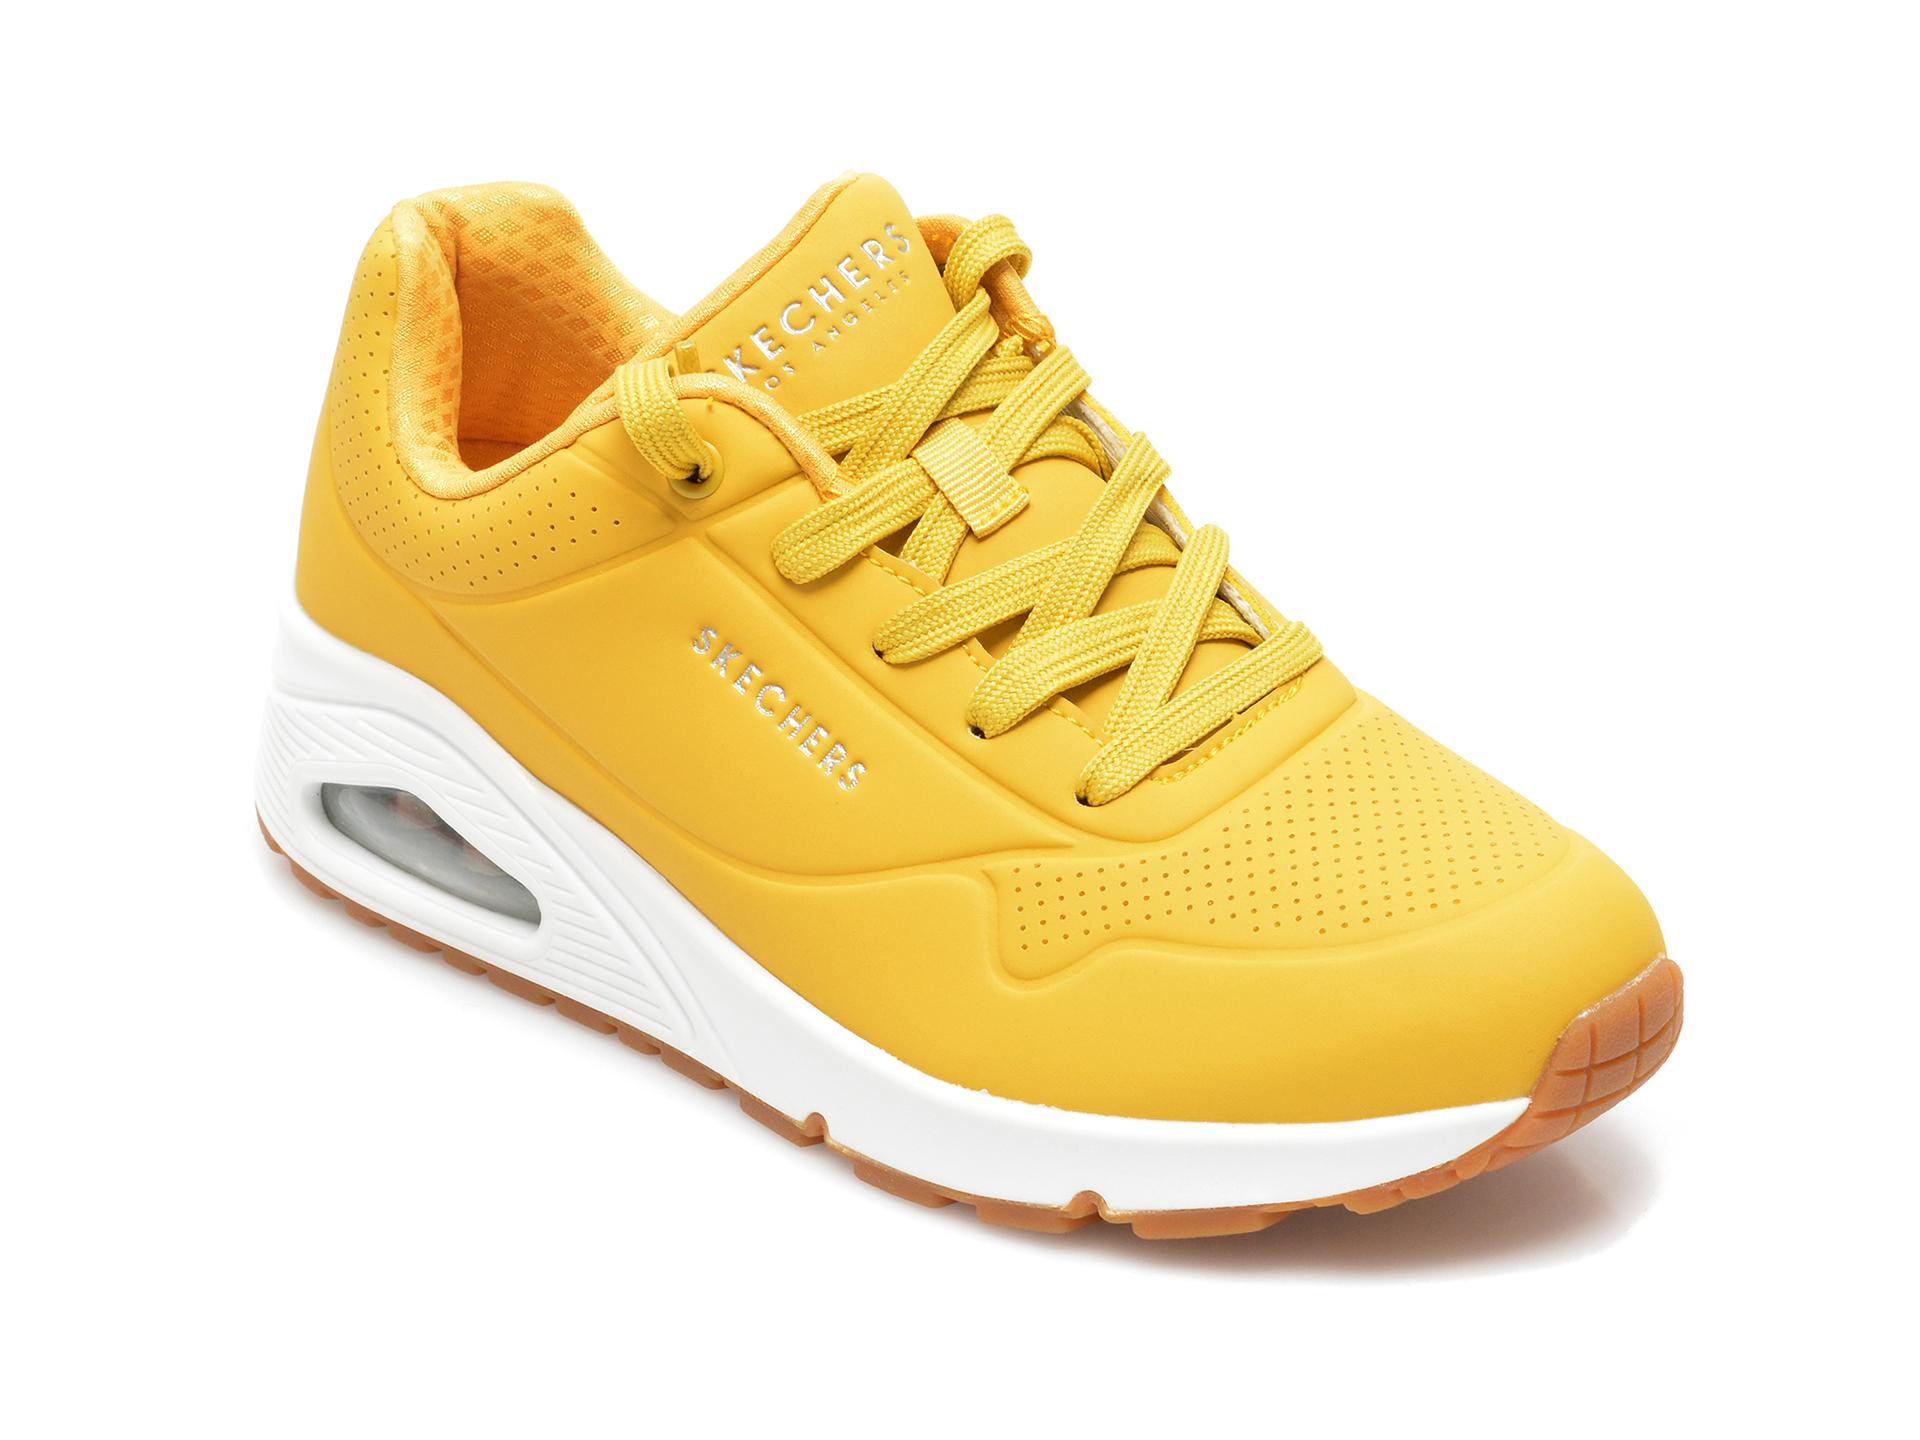 Pantofi Sport Skechers Galbeni, Unostand On Air, Din Piele Ecologica